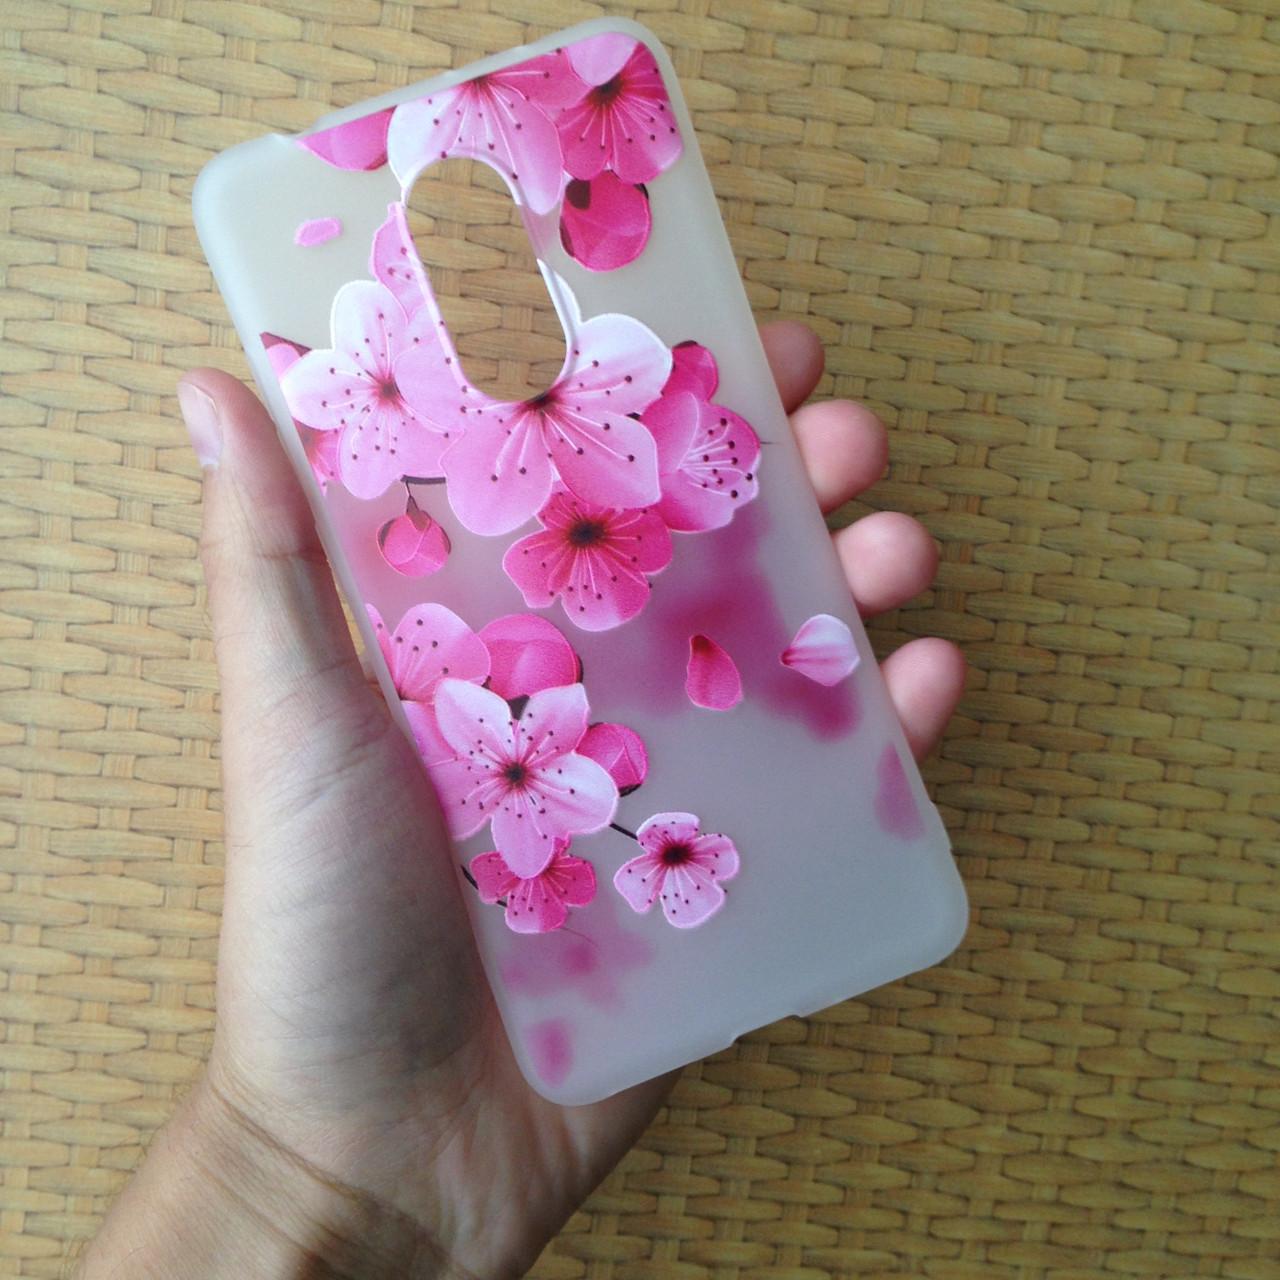 Чехол для Xiaomi Redmi 5, бампер, накладка, чохол, силиконовый, силіконовий